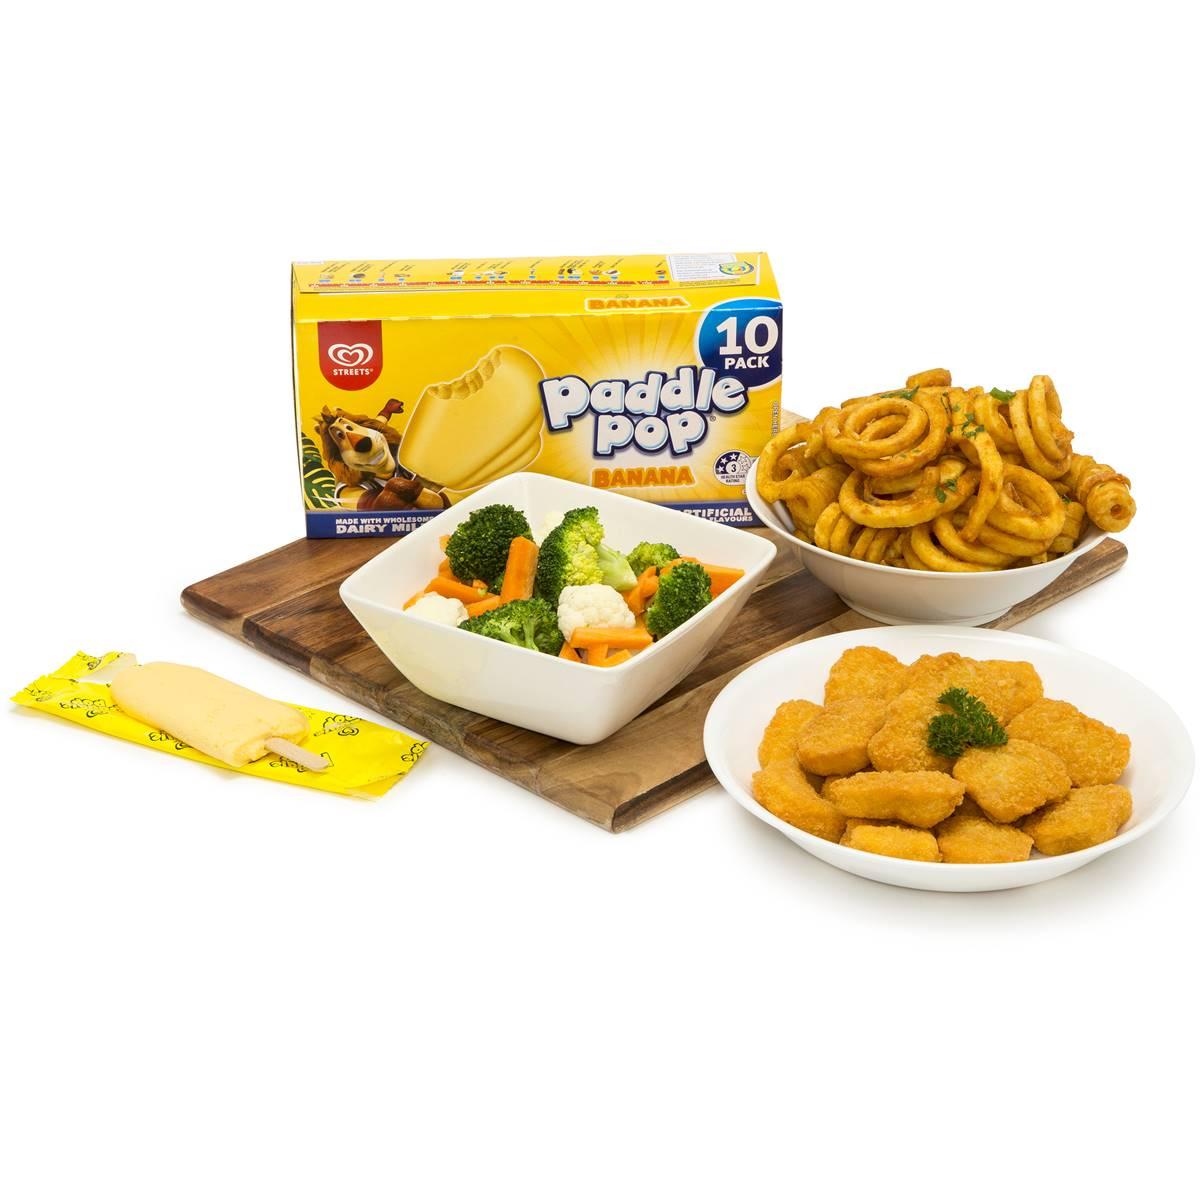 Chicken Nuggets, Curly Fries, Veggies & Banana Paddlepop